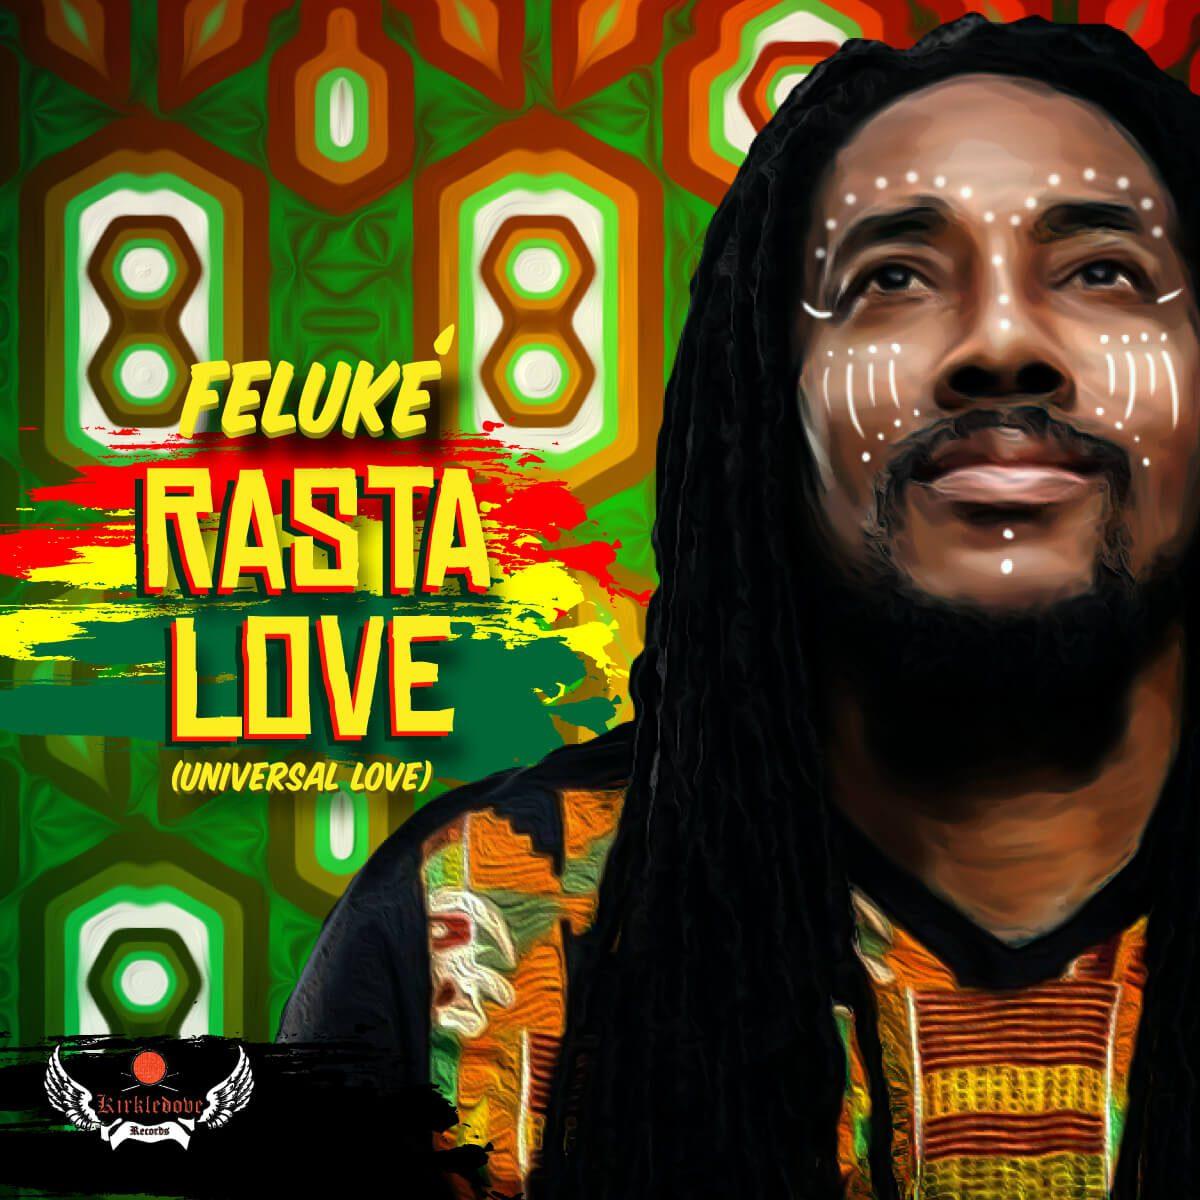 Rasta-Love-Feluke